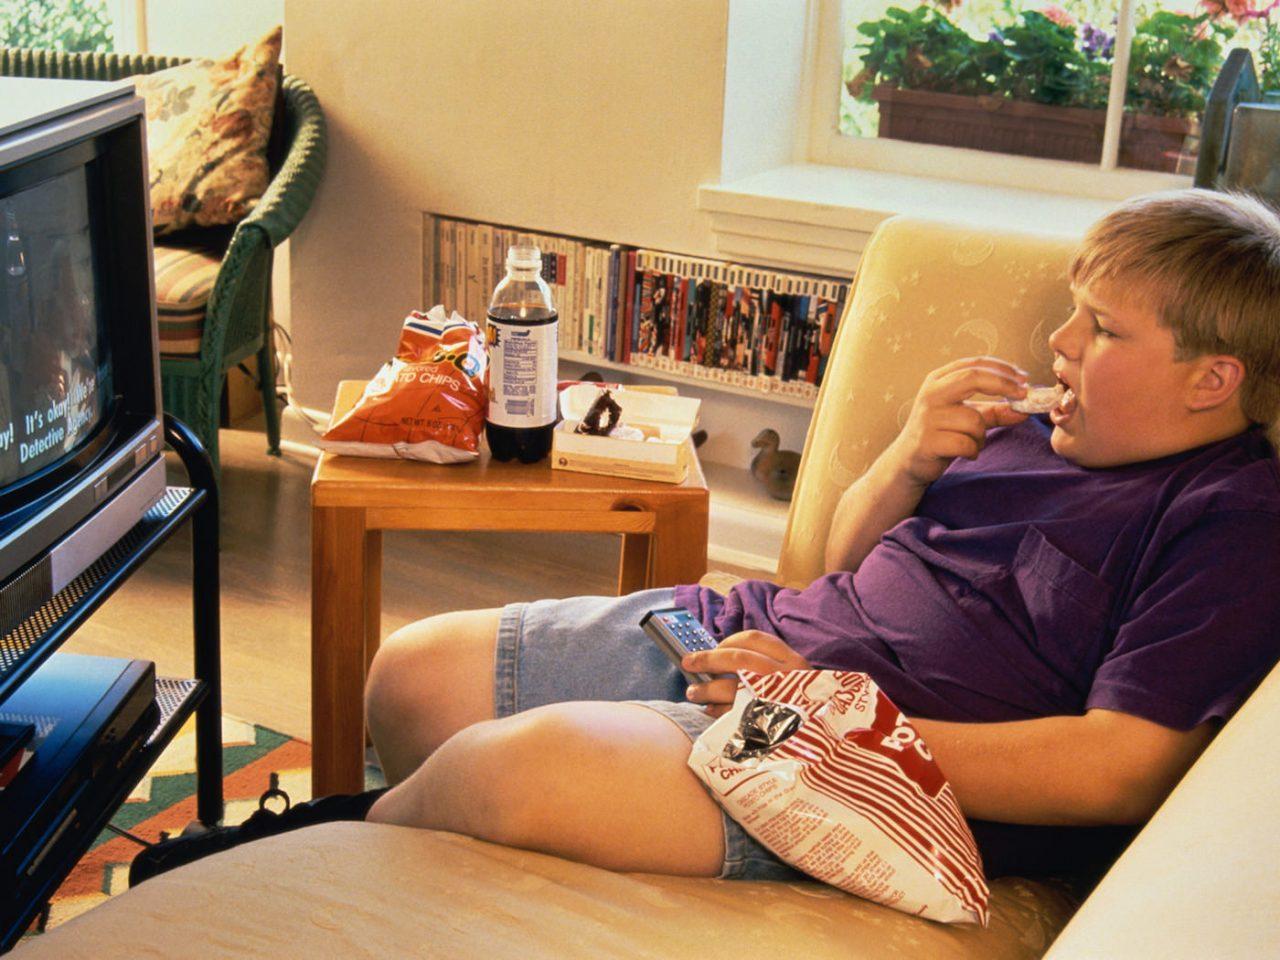 obesidade infantil nerdpai